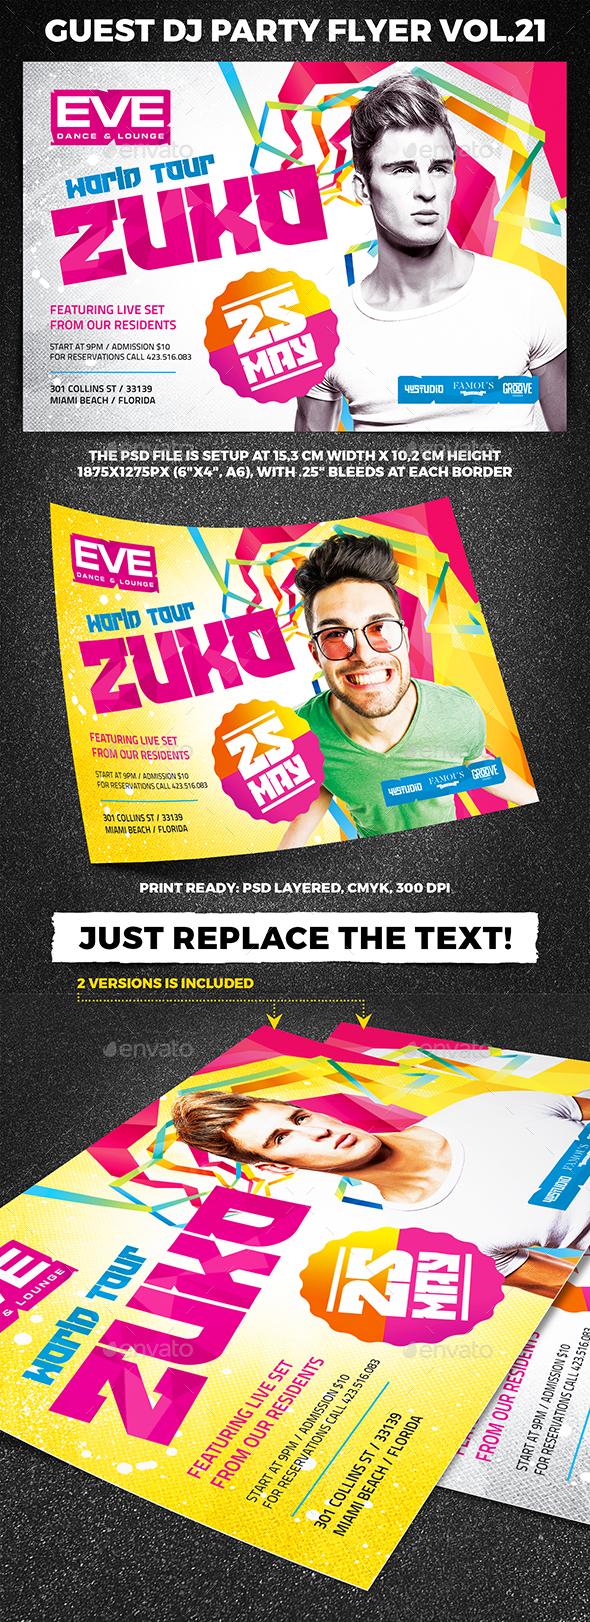 Guest DJ Party Flyer vol.21 - Clubs & Parties Events